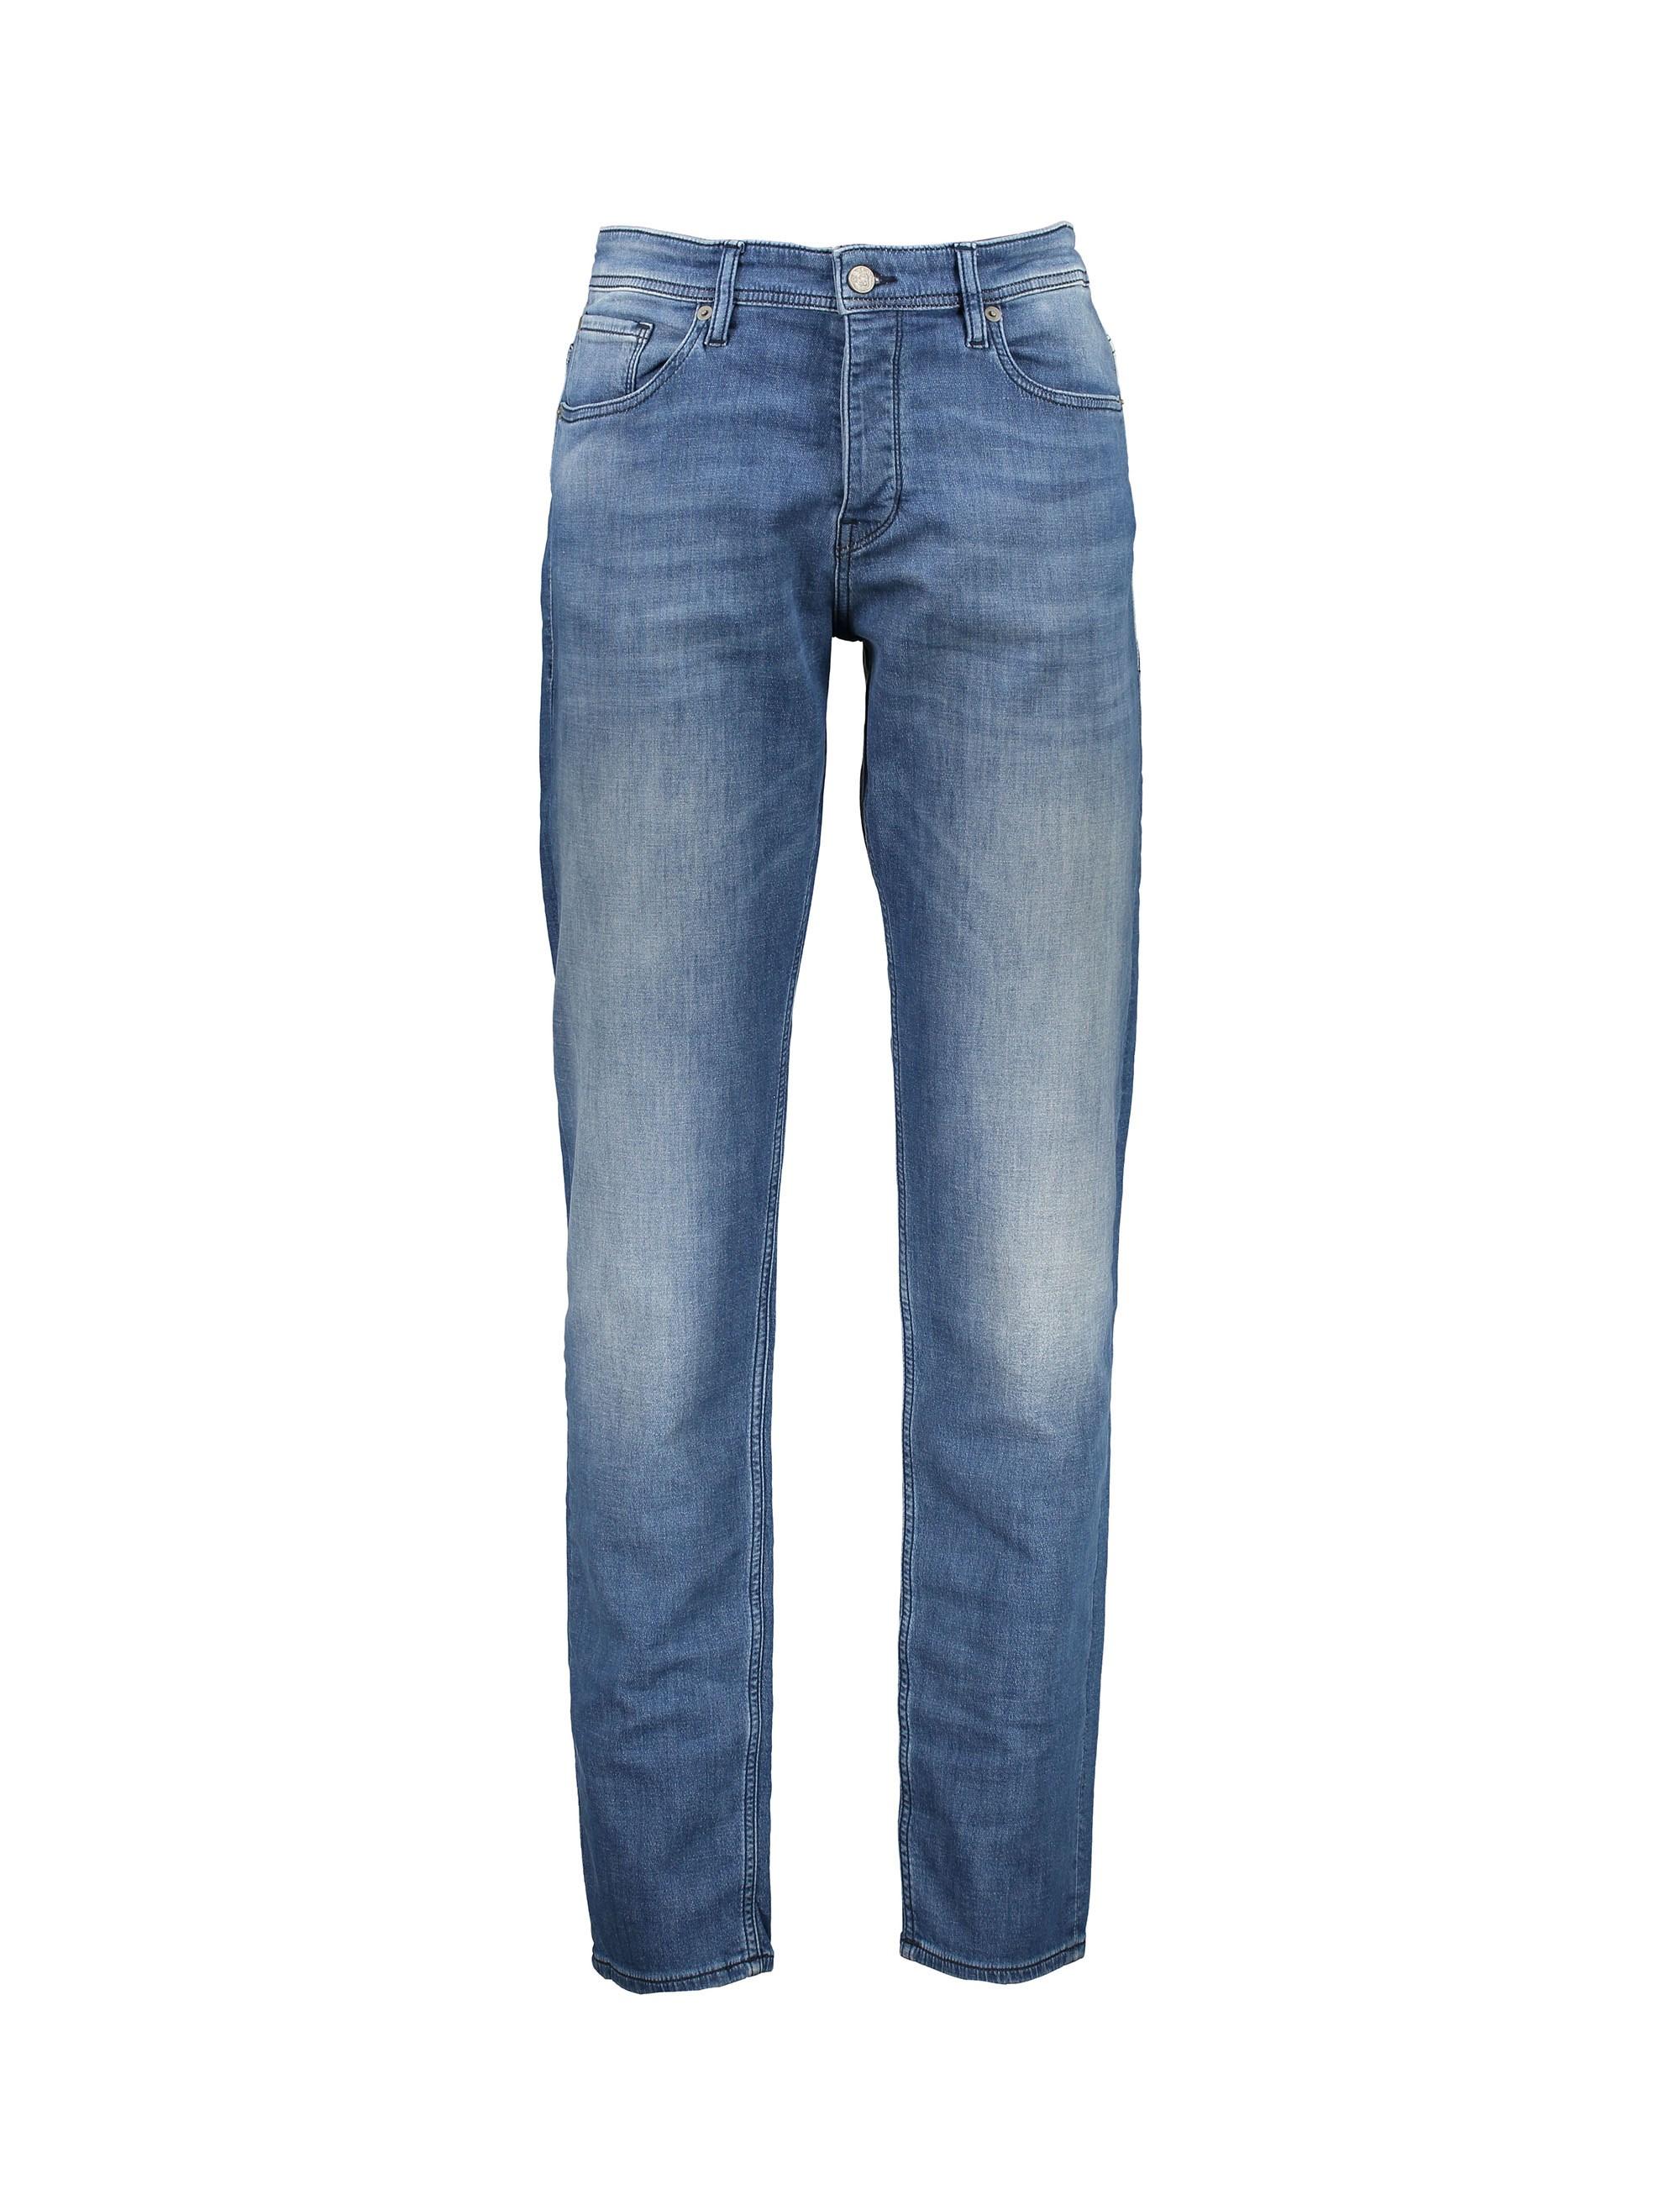 شلوار جین راسته مردانه Orange90-P SUAVE - باس اورنج - آبي تيره - 1